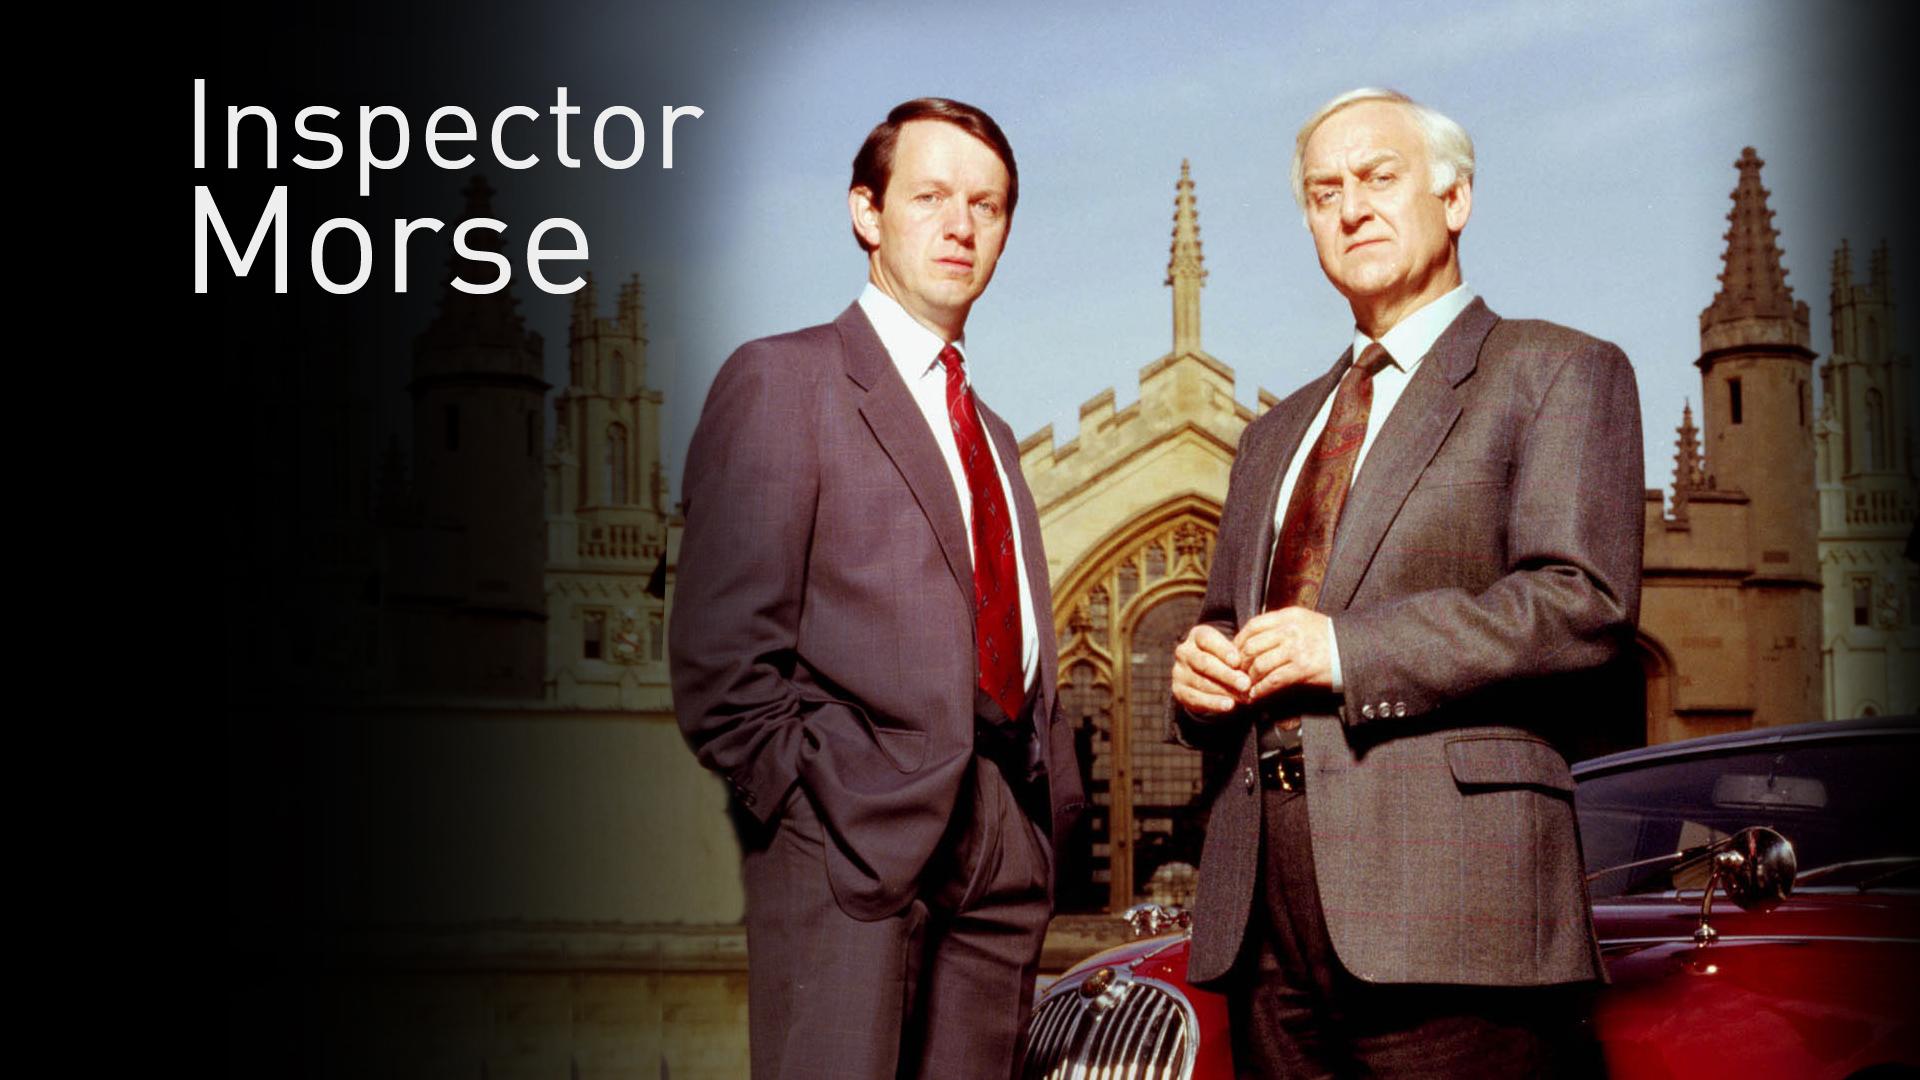 Inspector Morse